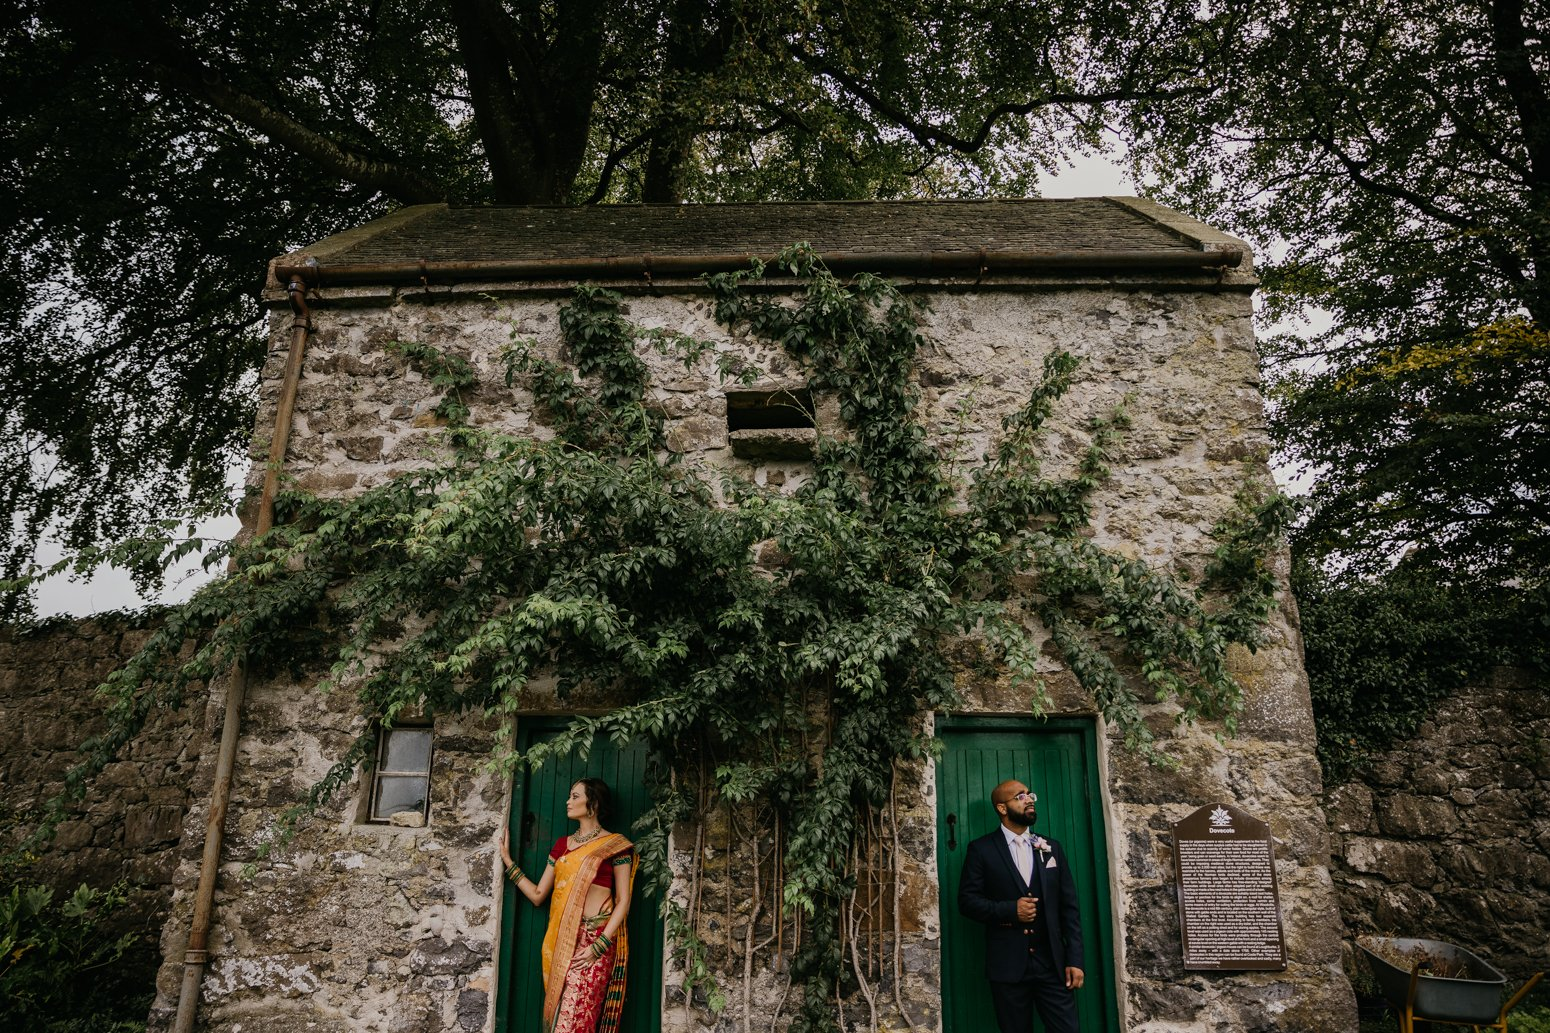 Contact Wedding Photography